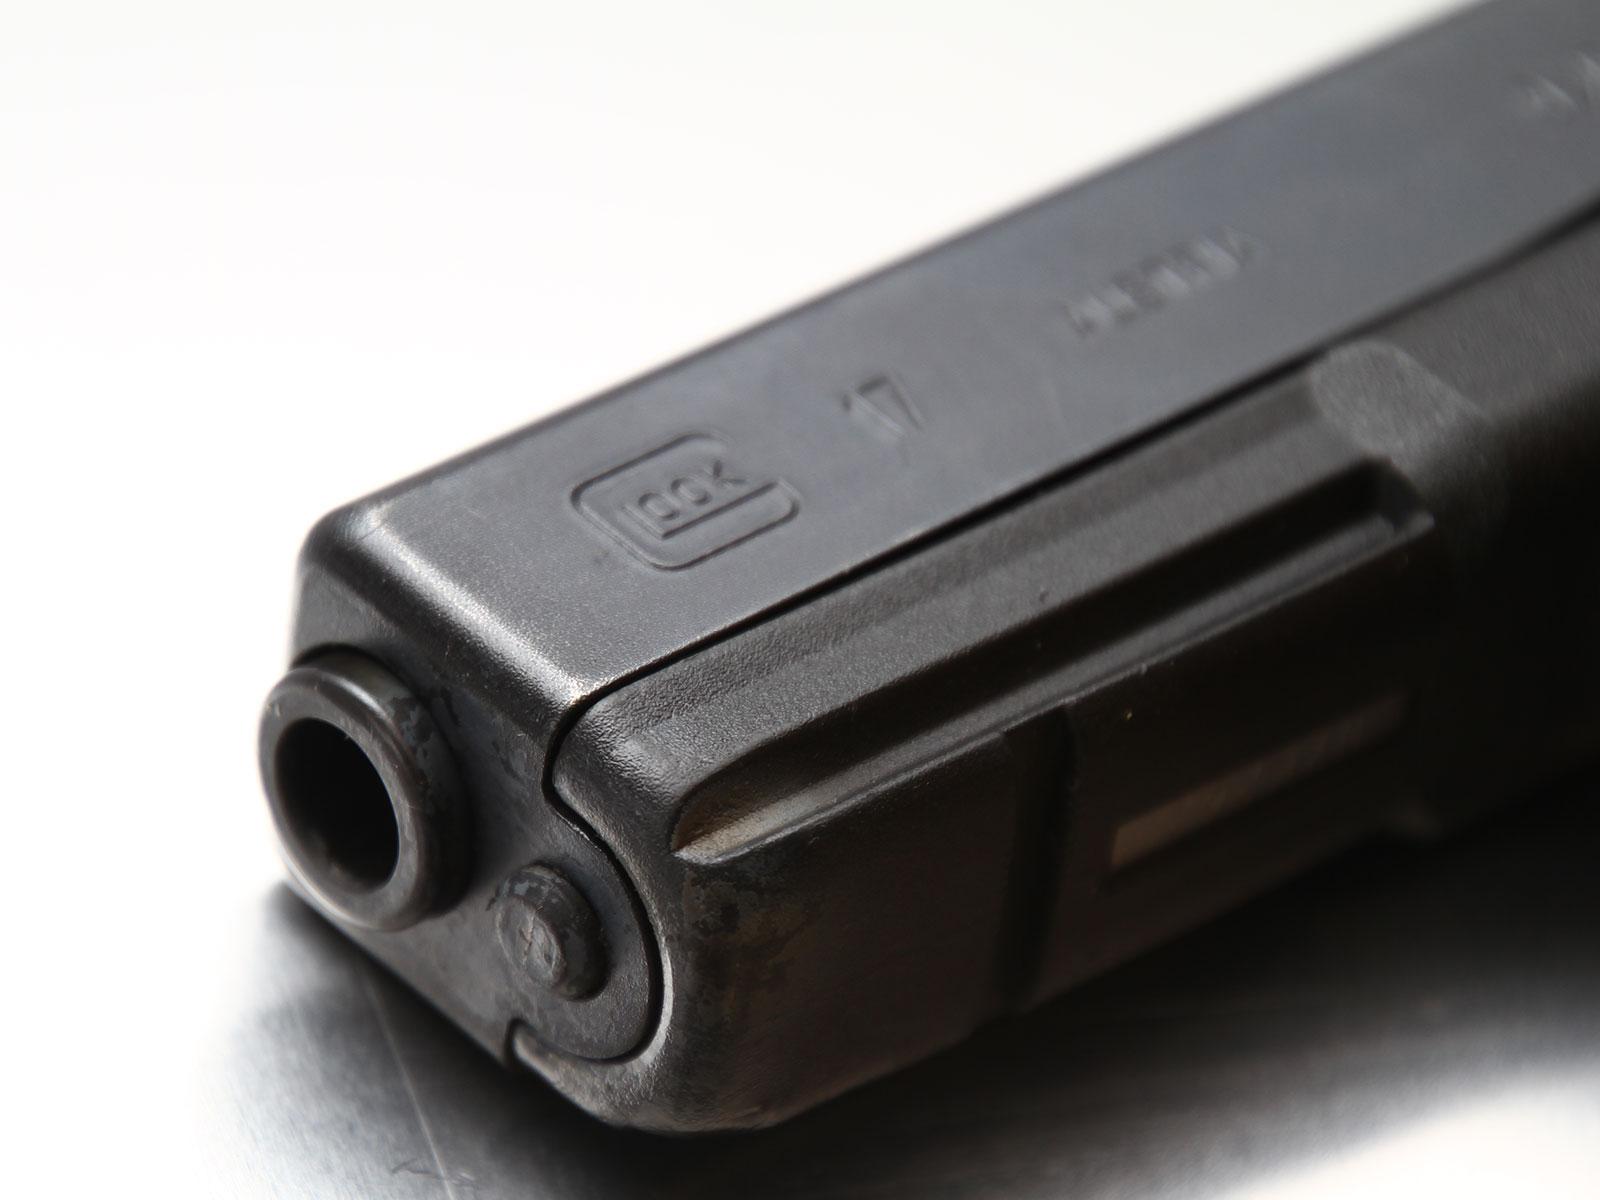 SH_Web_Wir_Waffen_Glock17-3_1800x1200